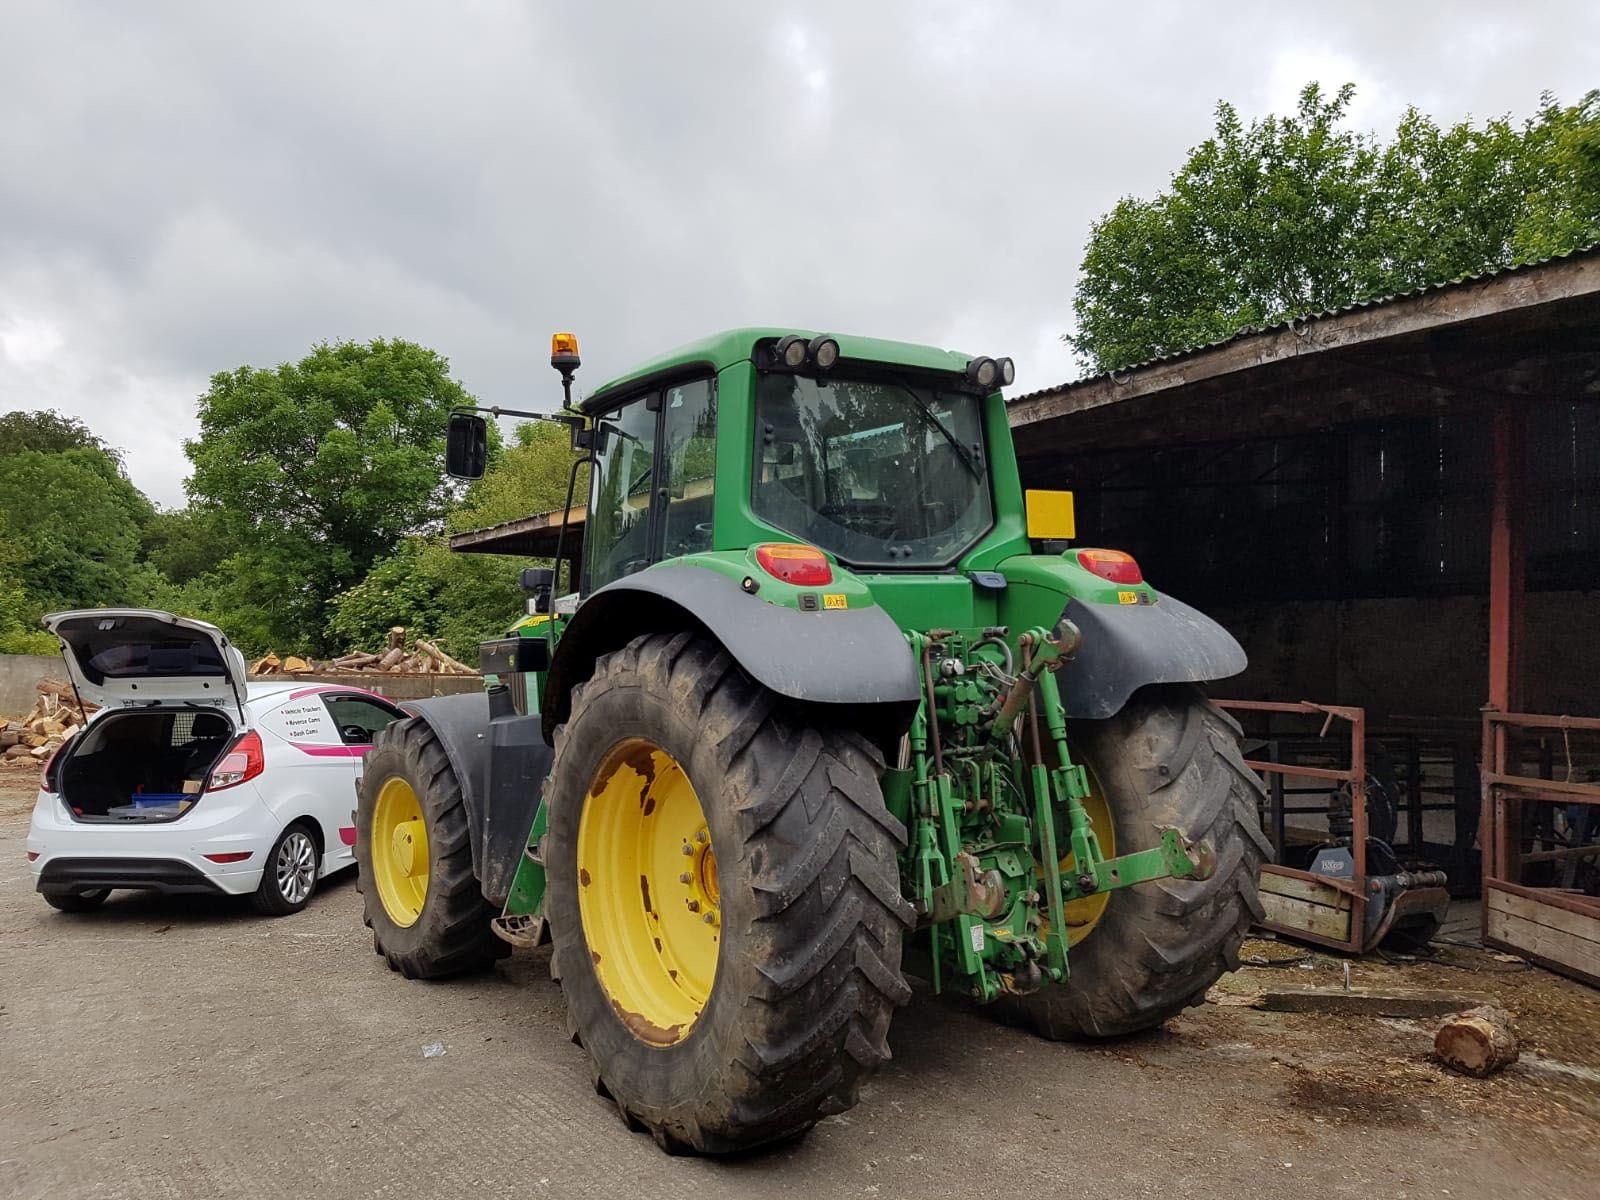 John Deere Tractor before installation of new radio